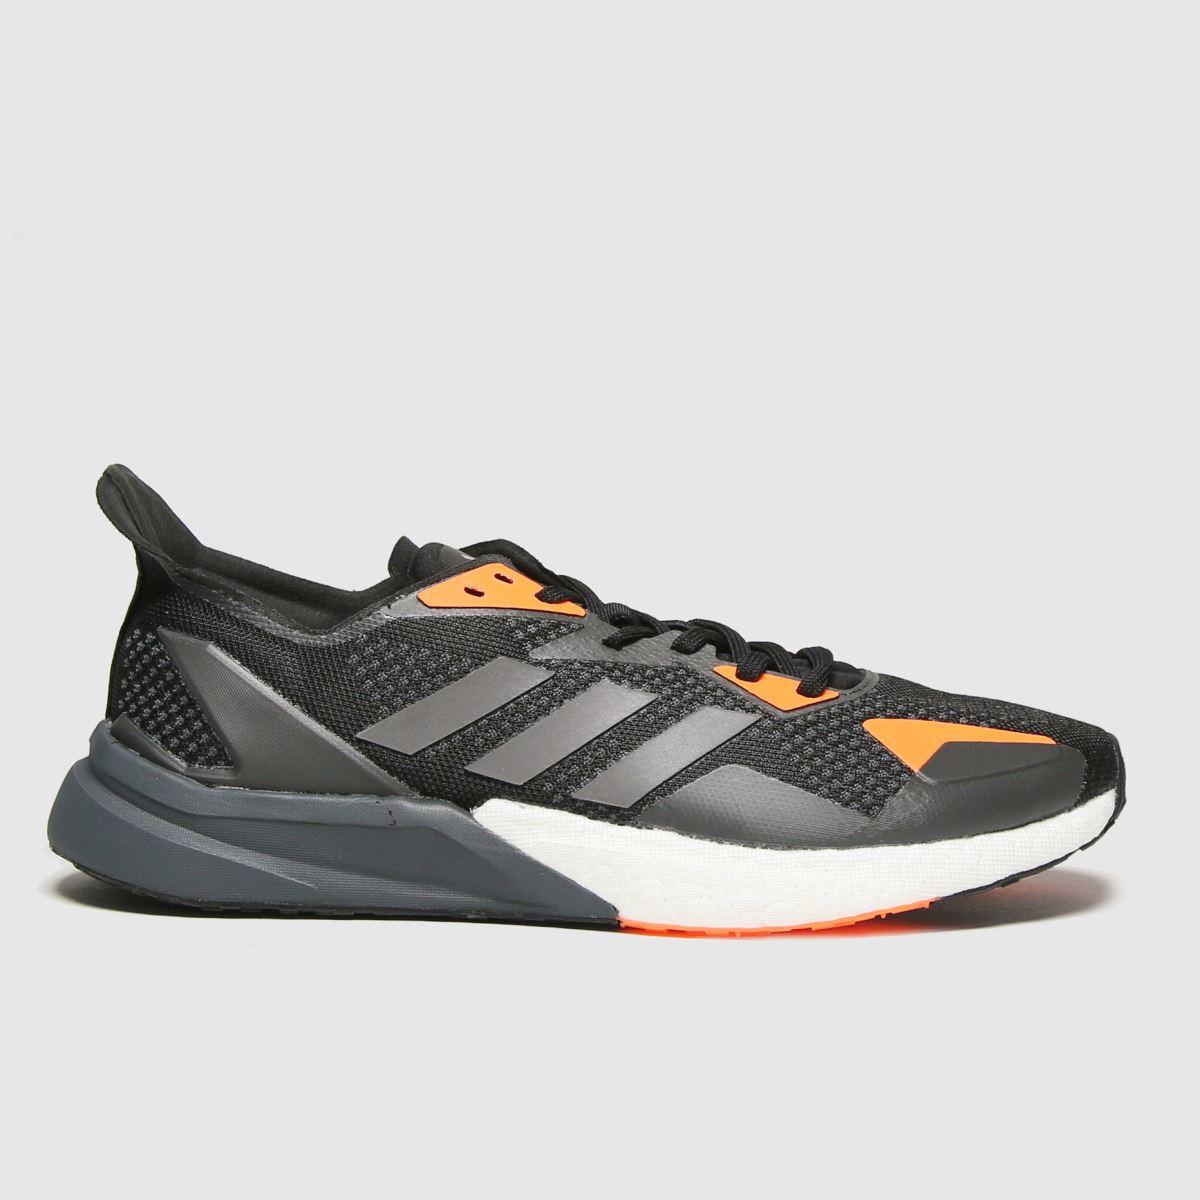 Adidas Black & Grey X9000l3 M Trainers